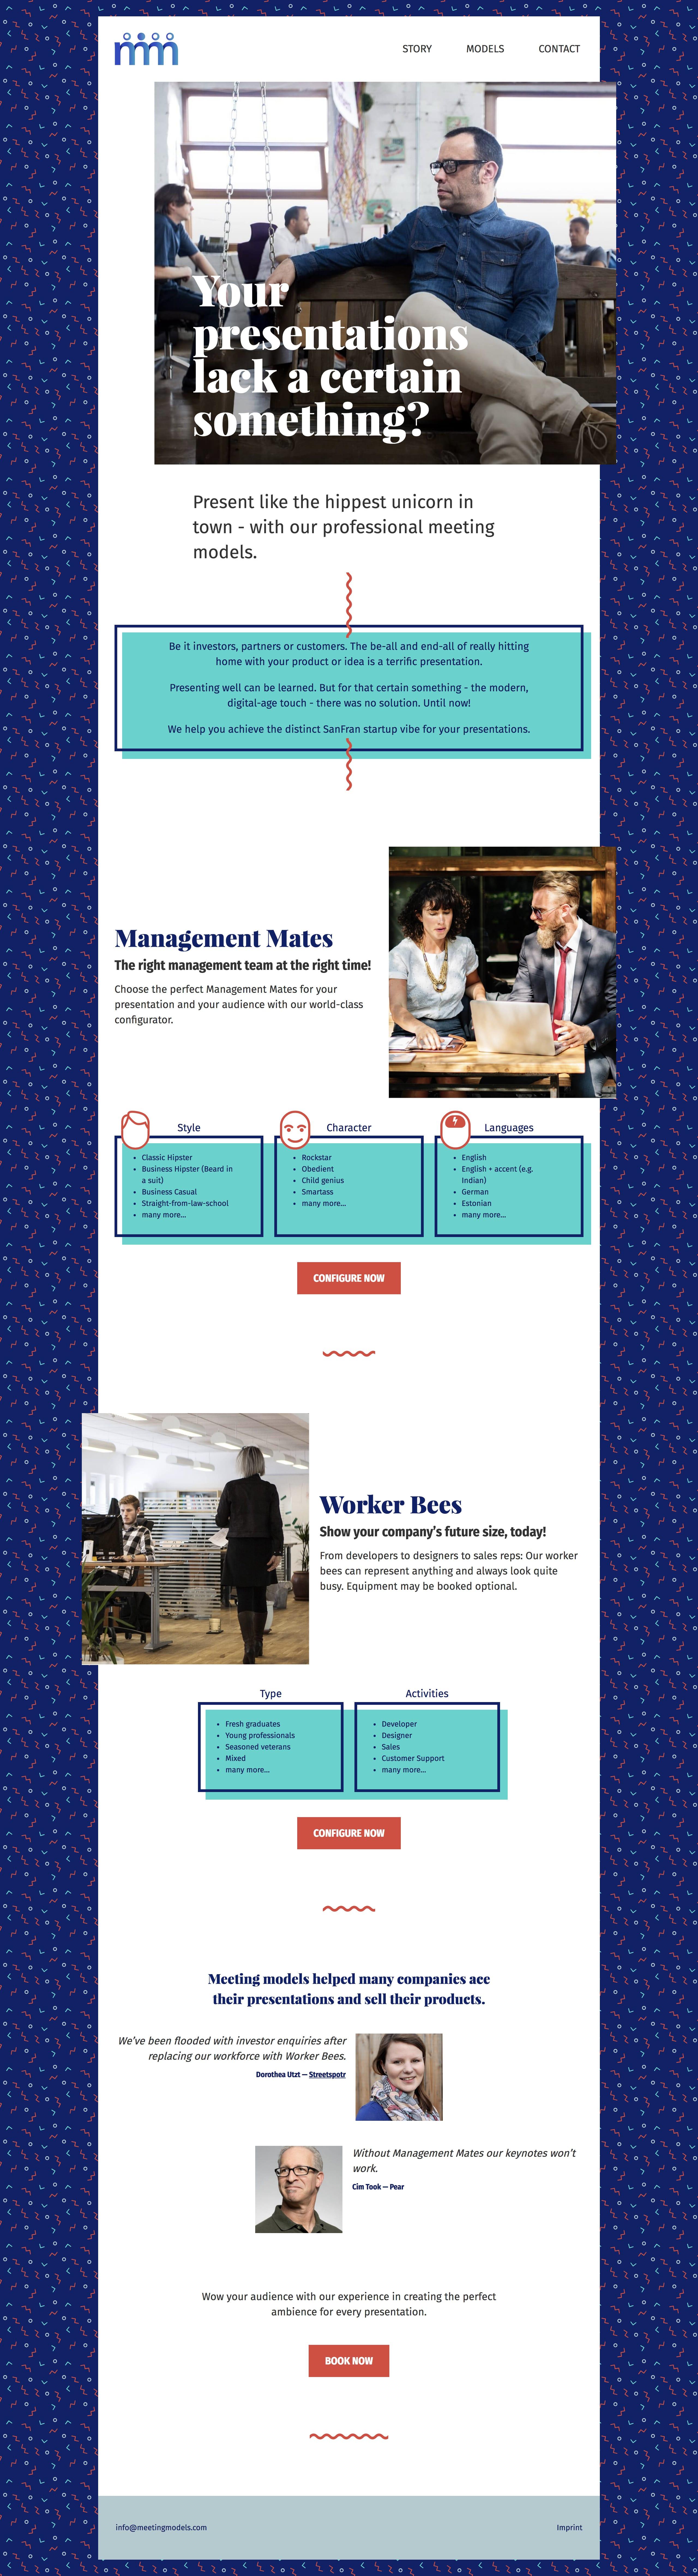 Meeting Models Website Screenshot